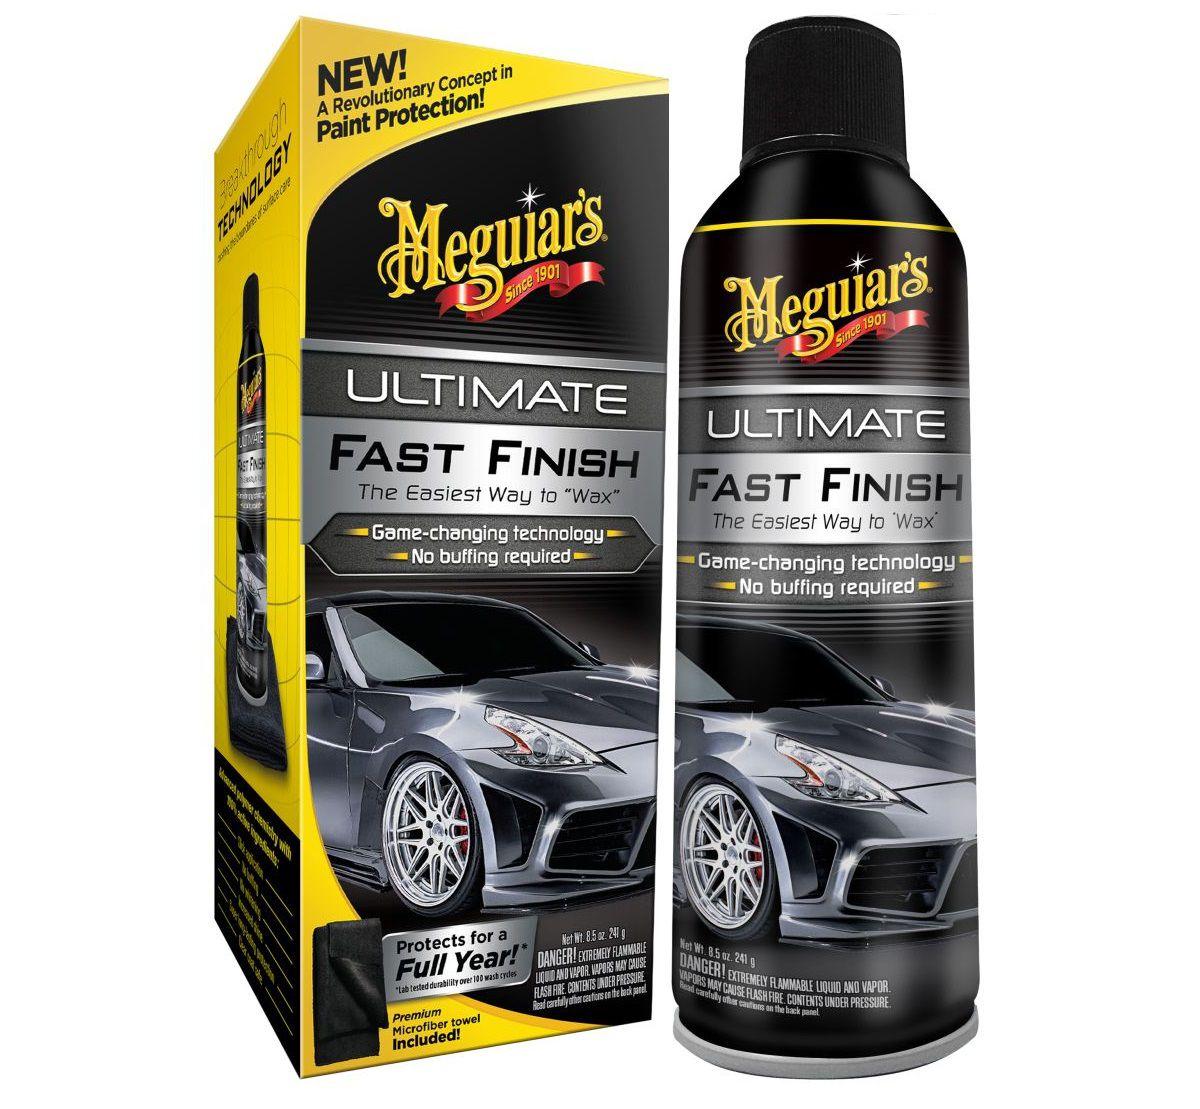 Cera Protetora Spray Ultimate Fast Finish 251,4ml Meguiars + Camisa Brinde